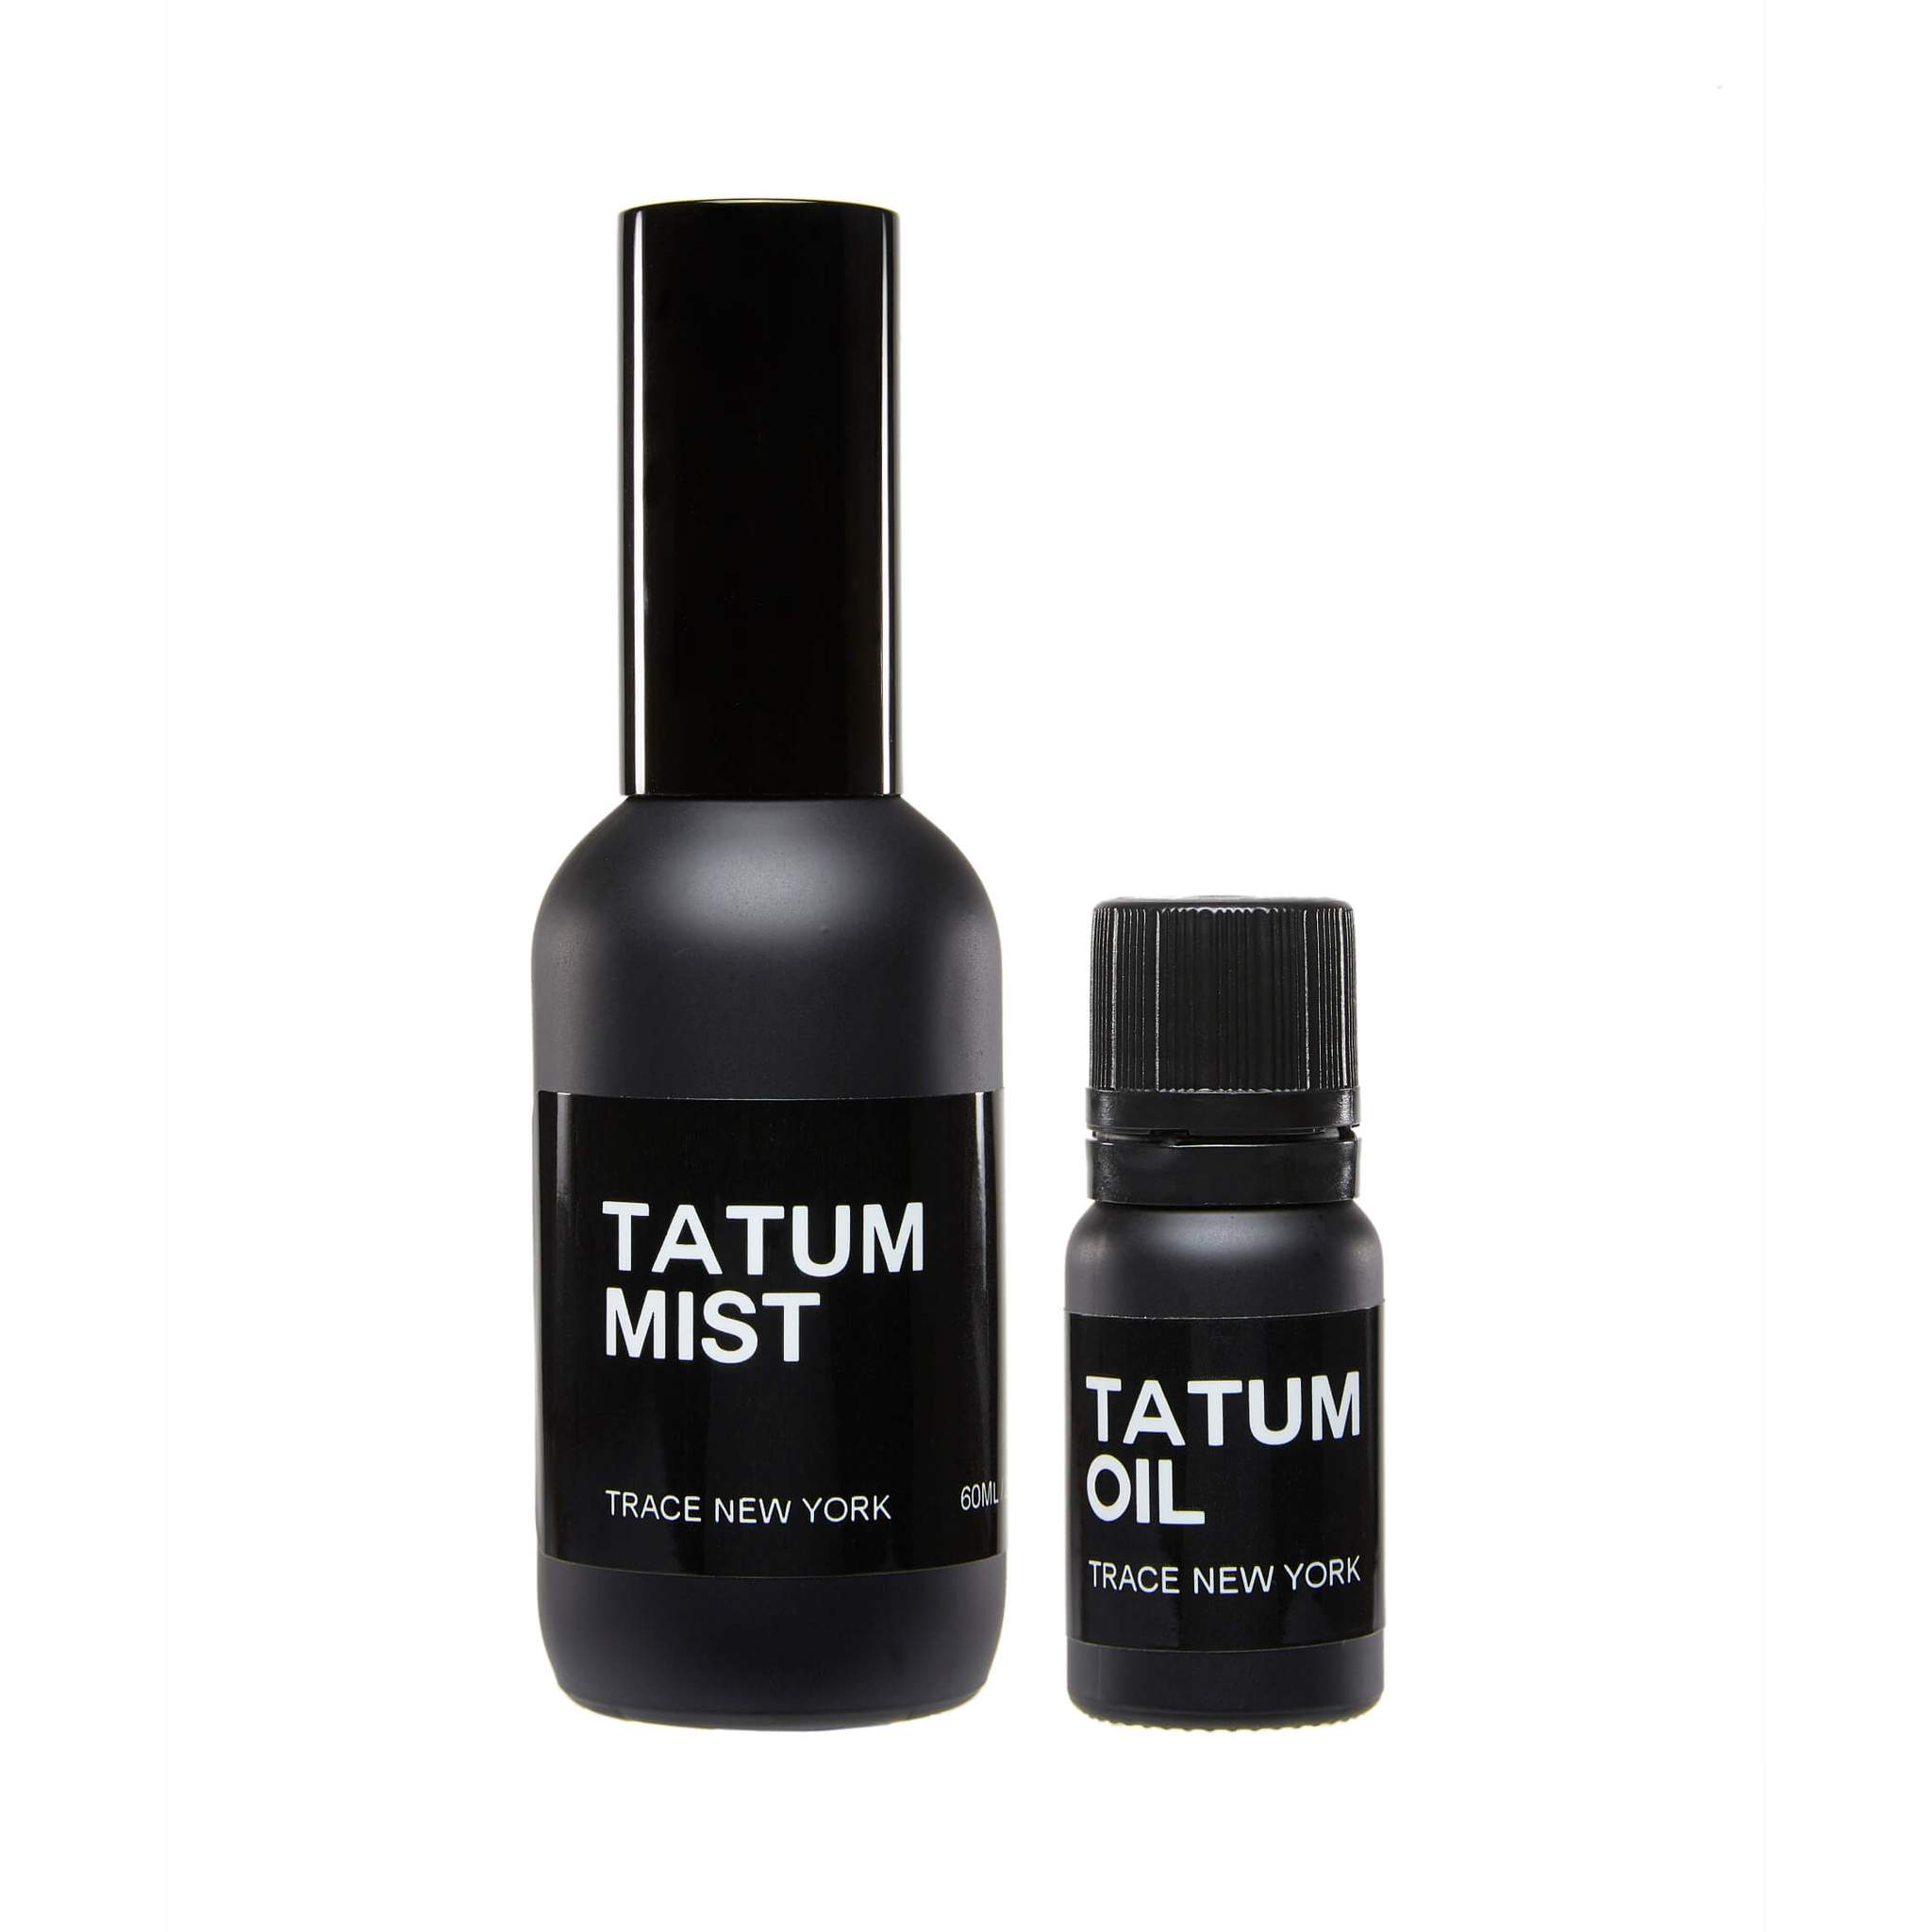 TNY-TATUM-Duo